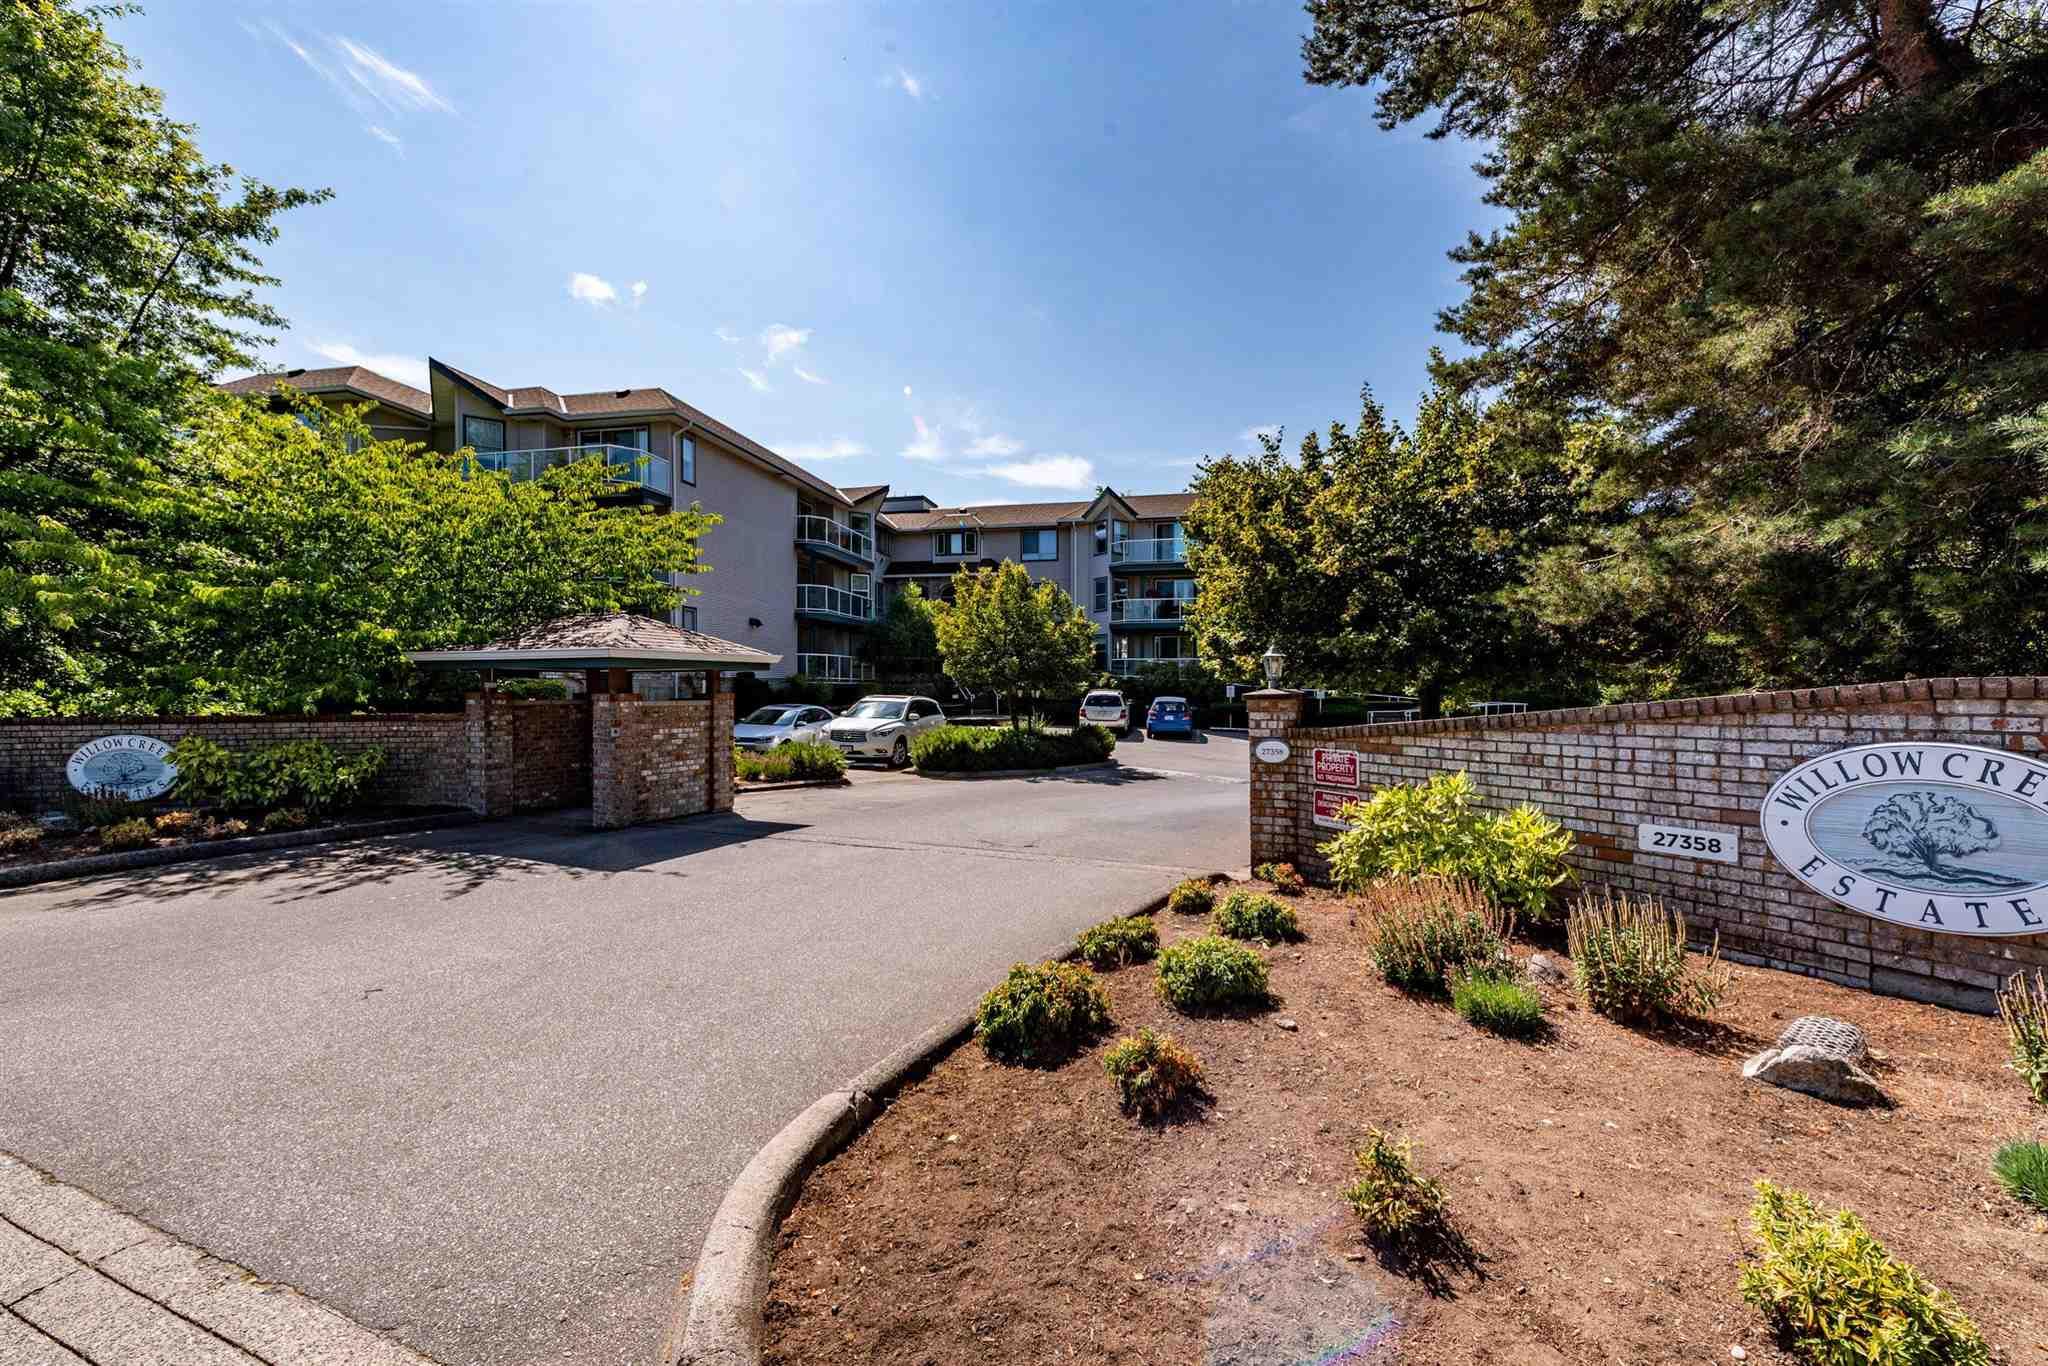 204 27358 32 AVENUE - Aldergrove Langley Apartment/Condo for sale, 2 Bedrooms (R2605265) - #1